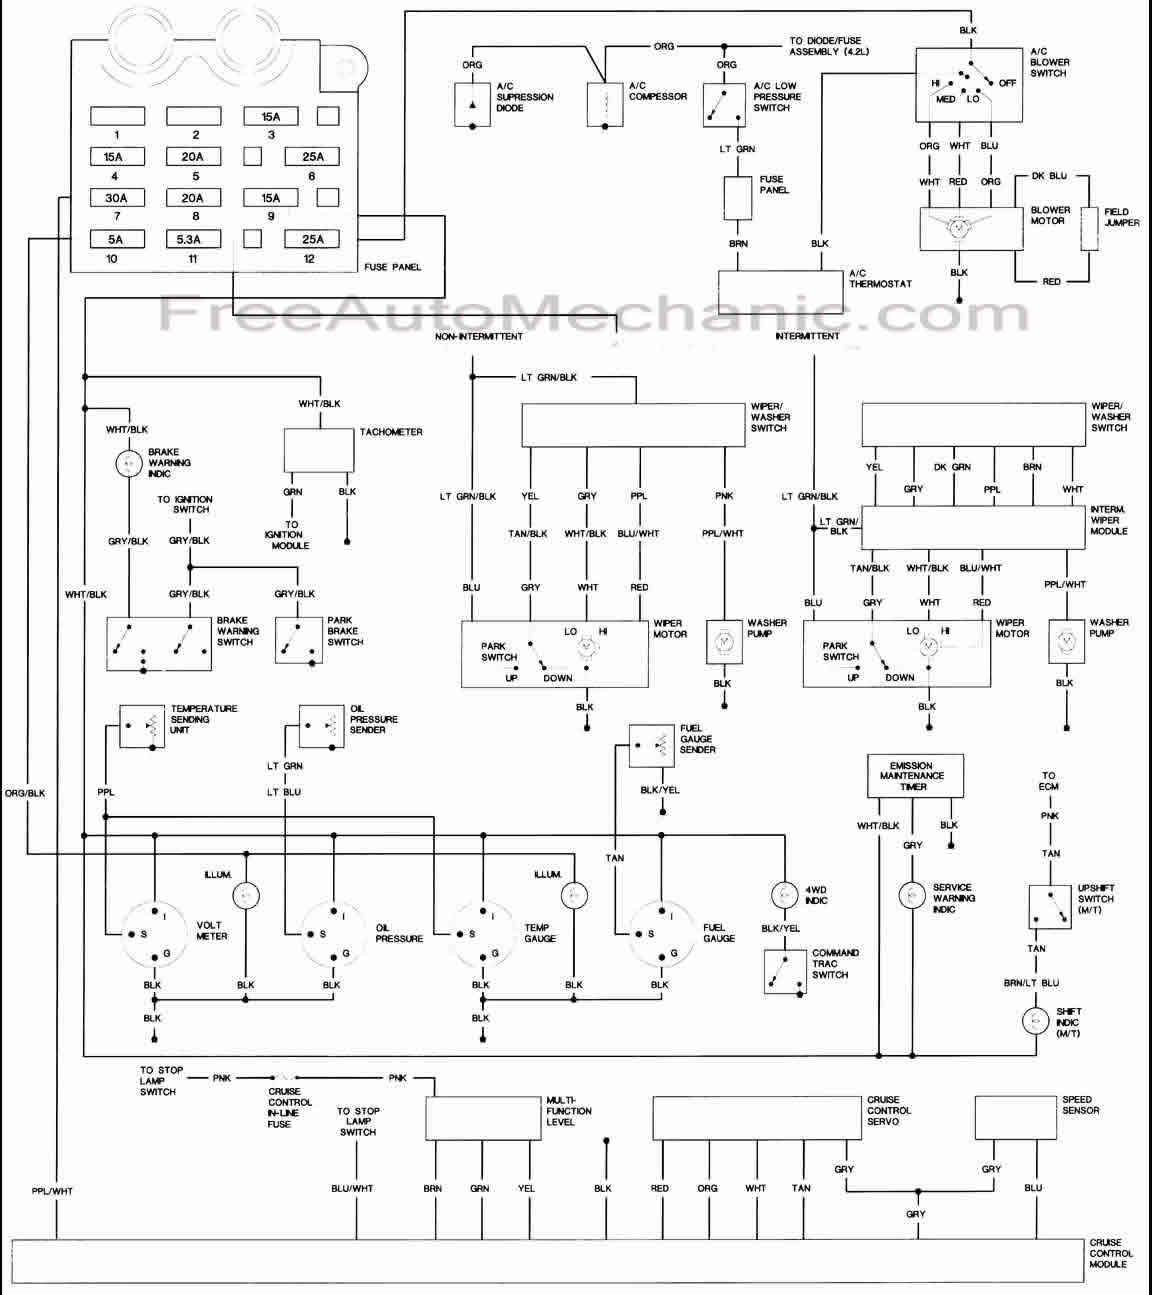 1995 Jeep Wrangler Wiring Diagram 1995 Jeep Wrangler Wiring